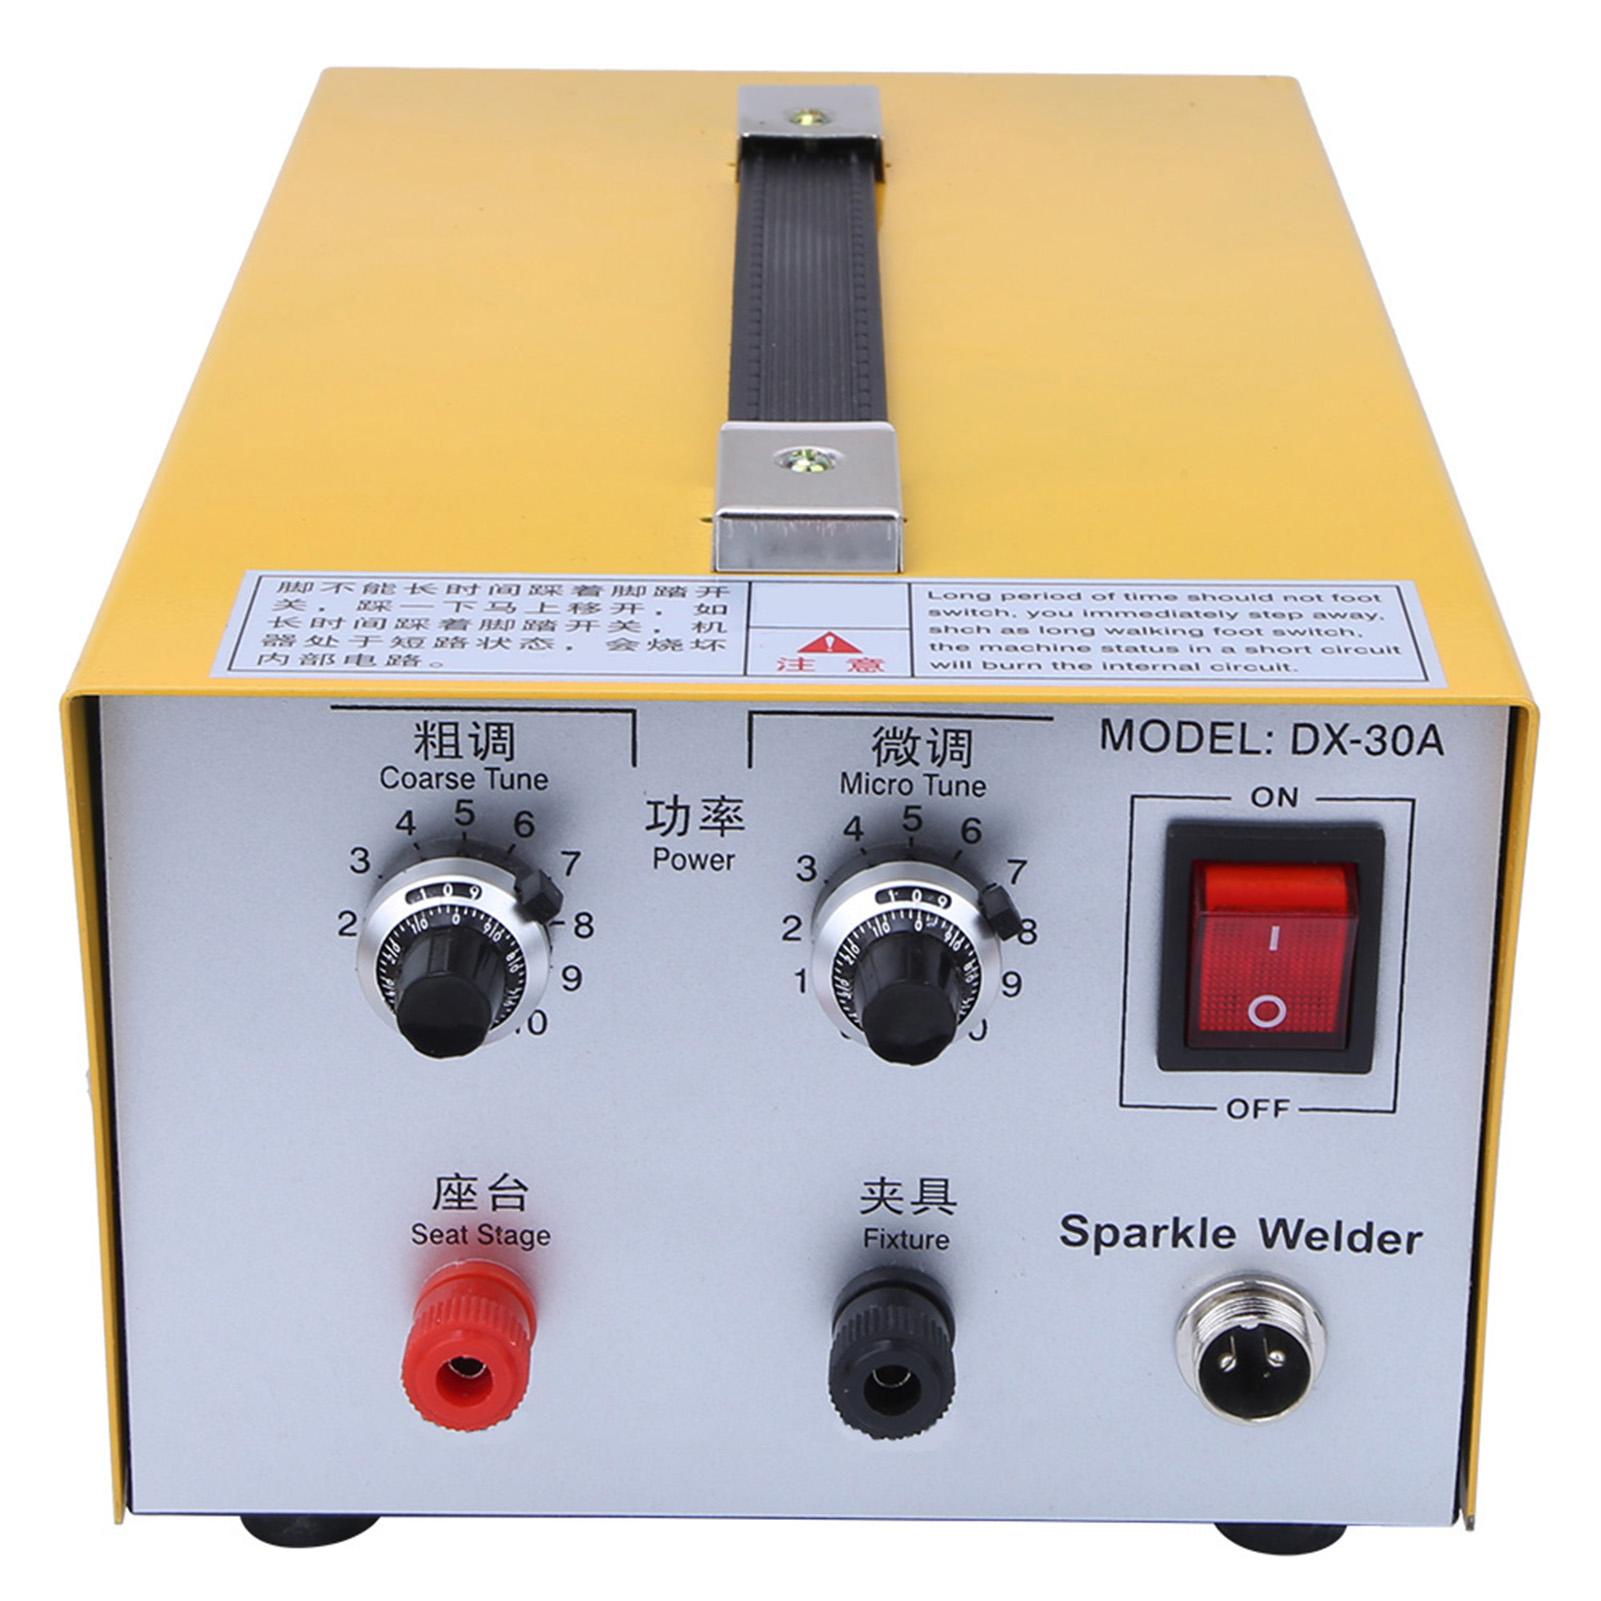 30A Mini Spot Welder Spot Welding Machine Jewelry Tool Foot Pedal Control